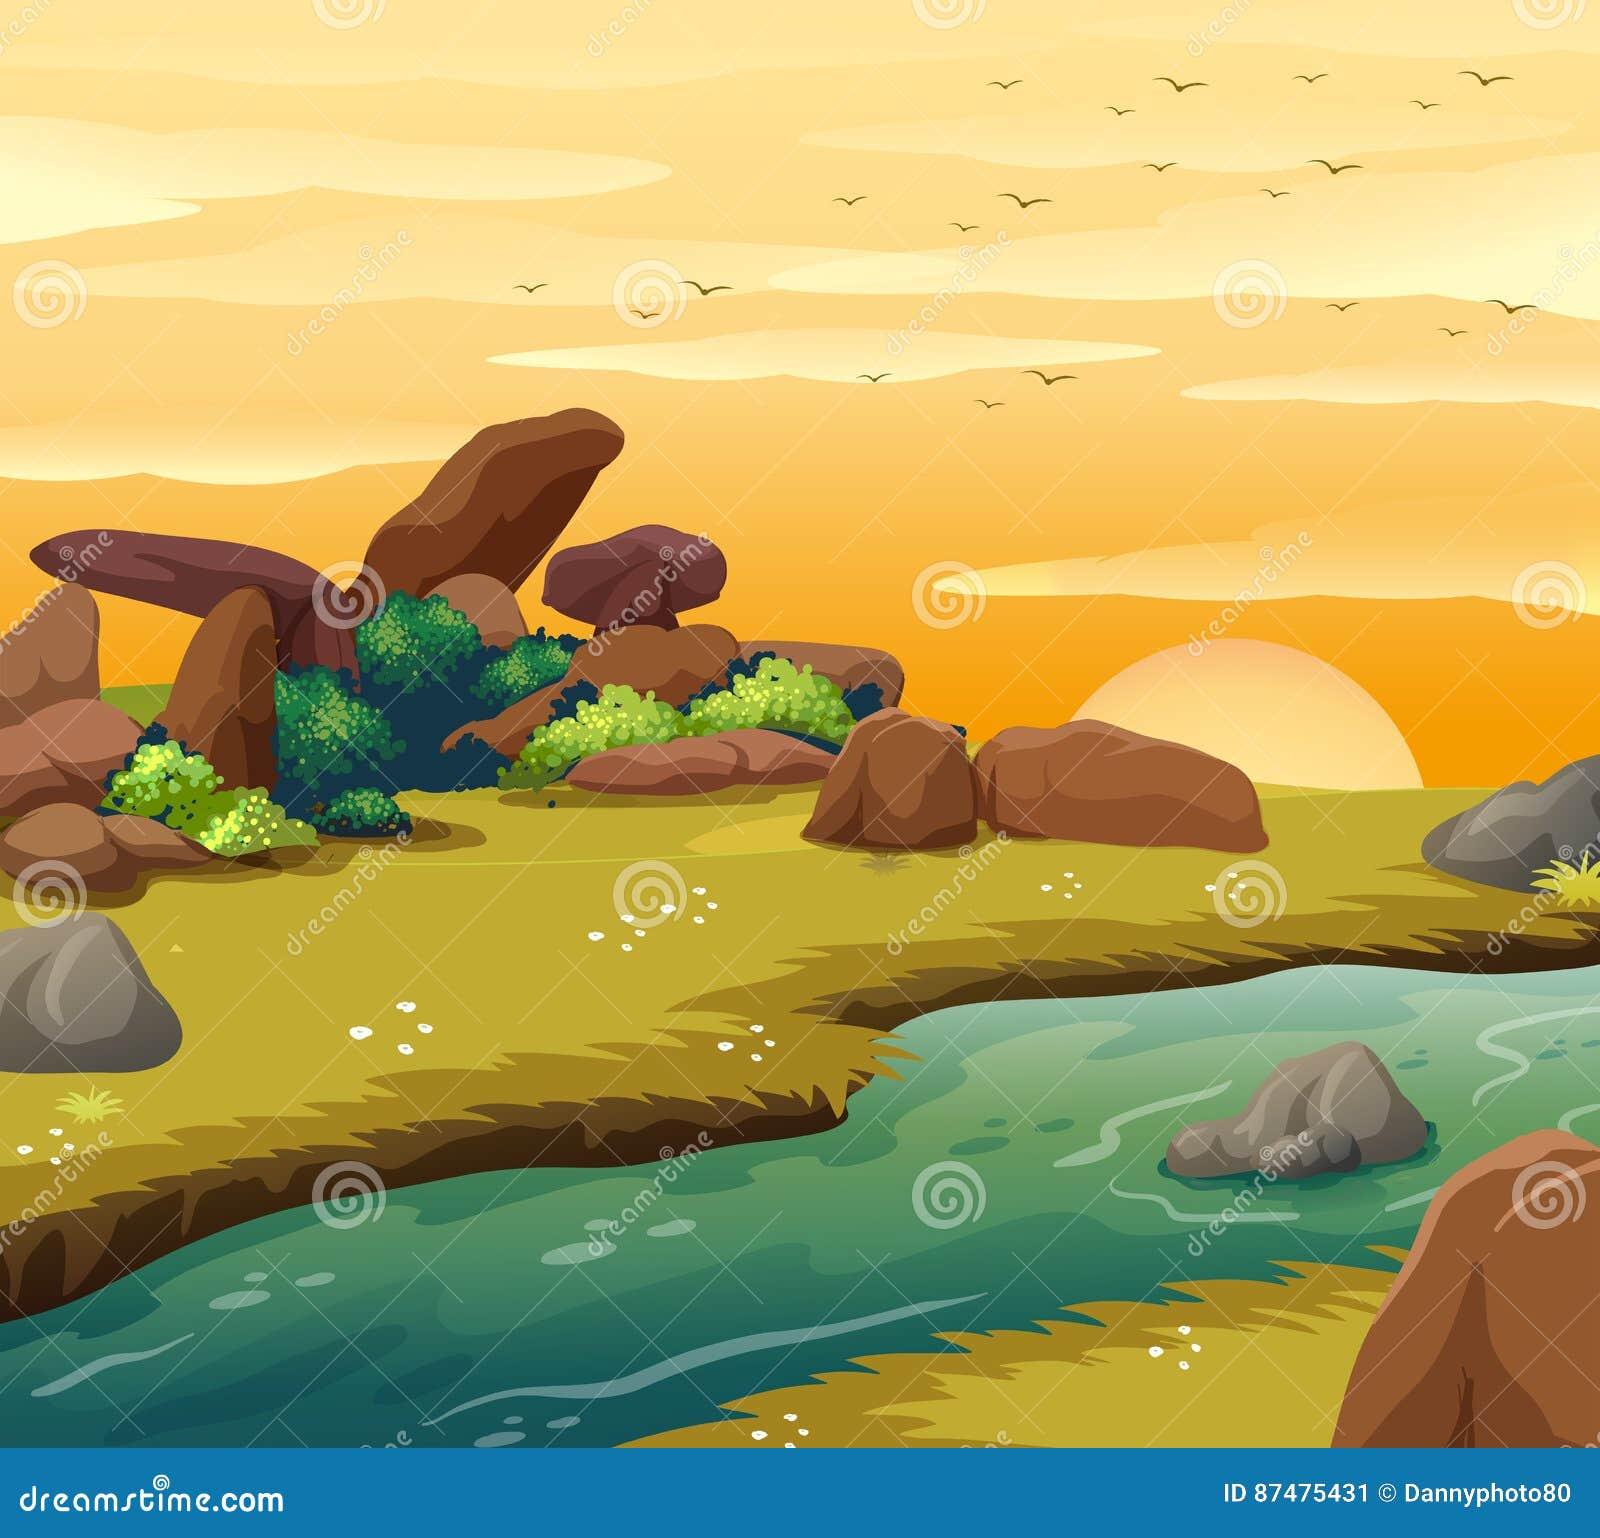 Hintergrundszene mit Fluss bei Sonnenuntergang